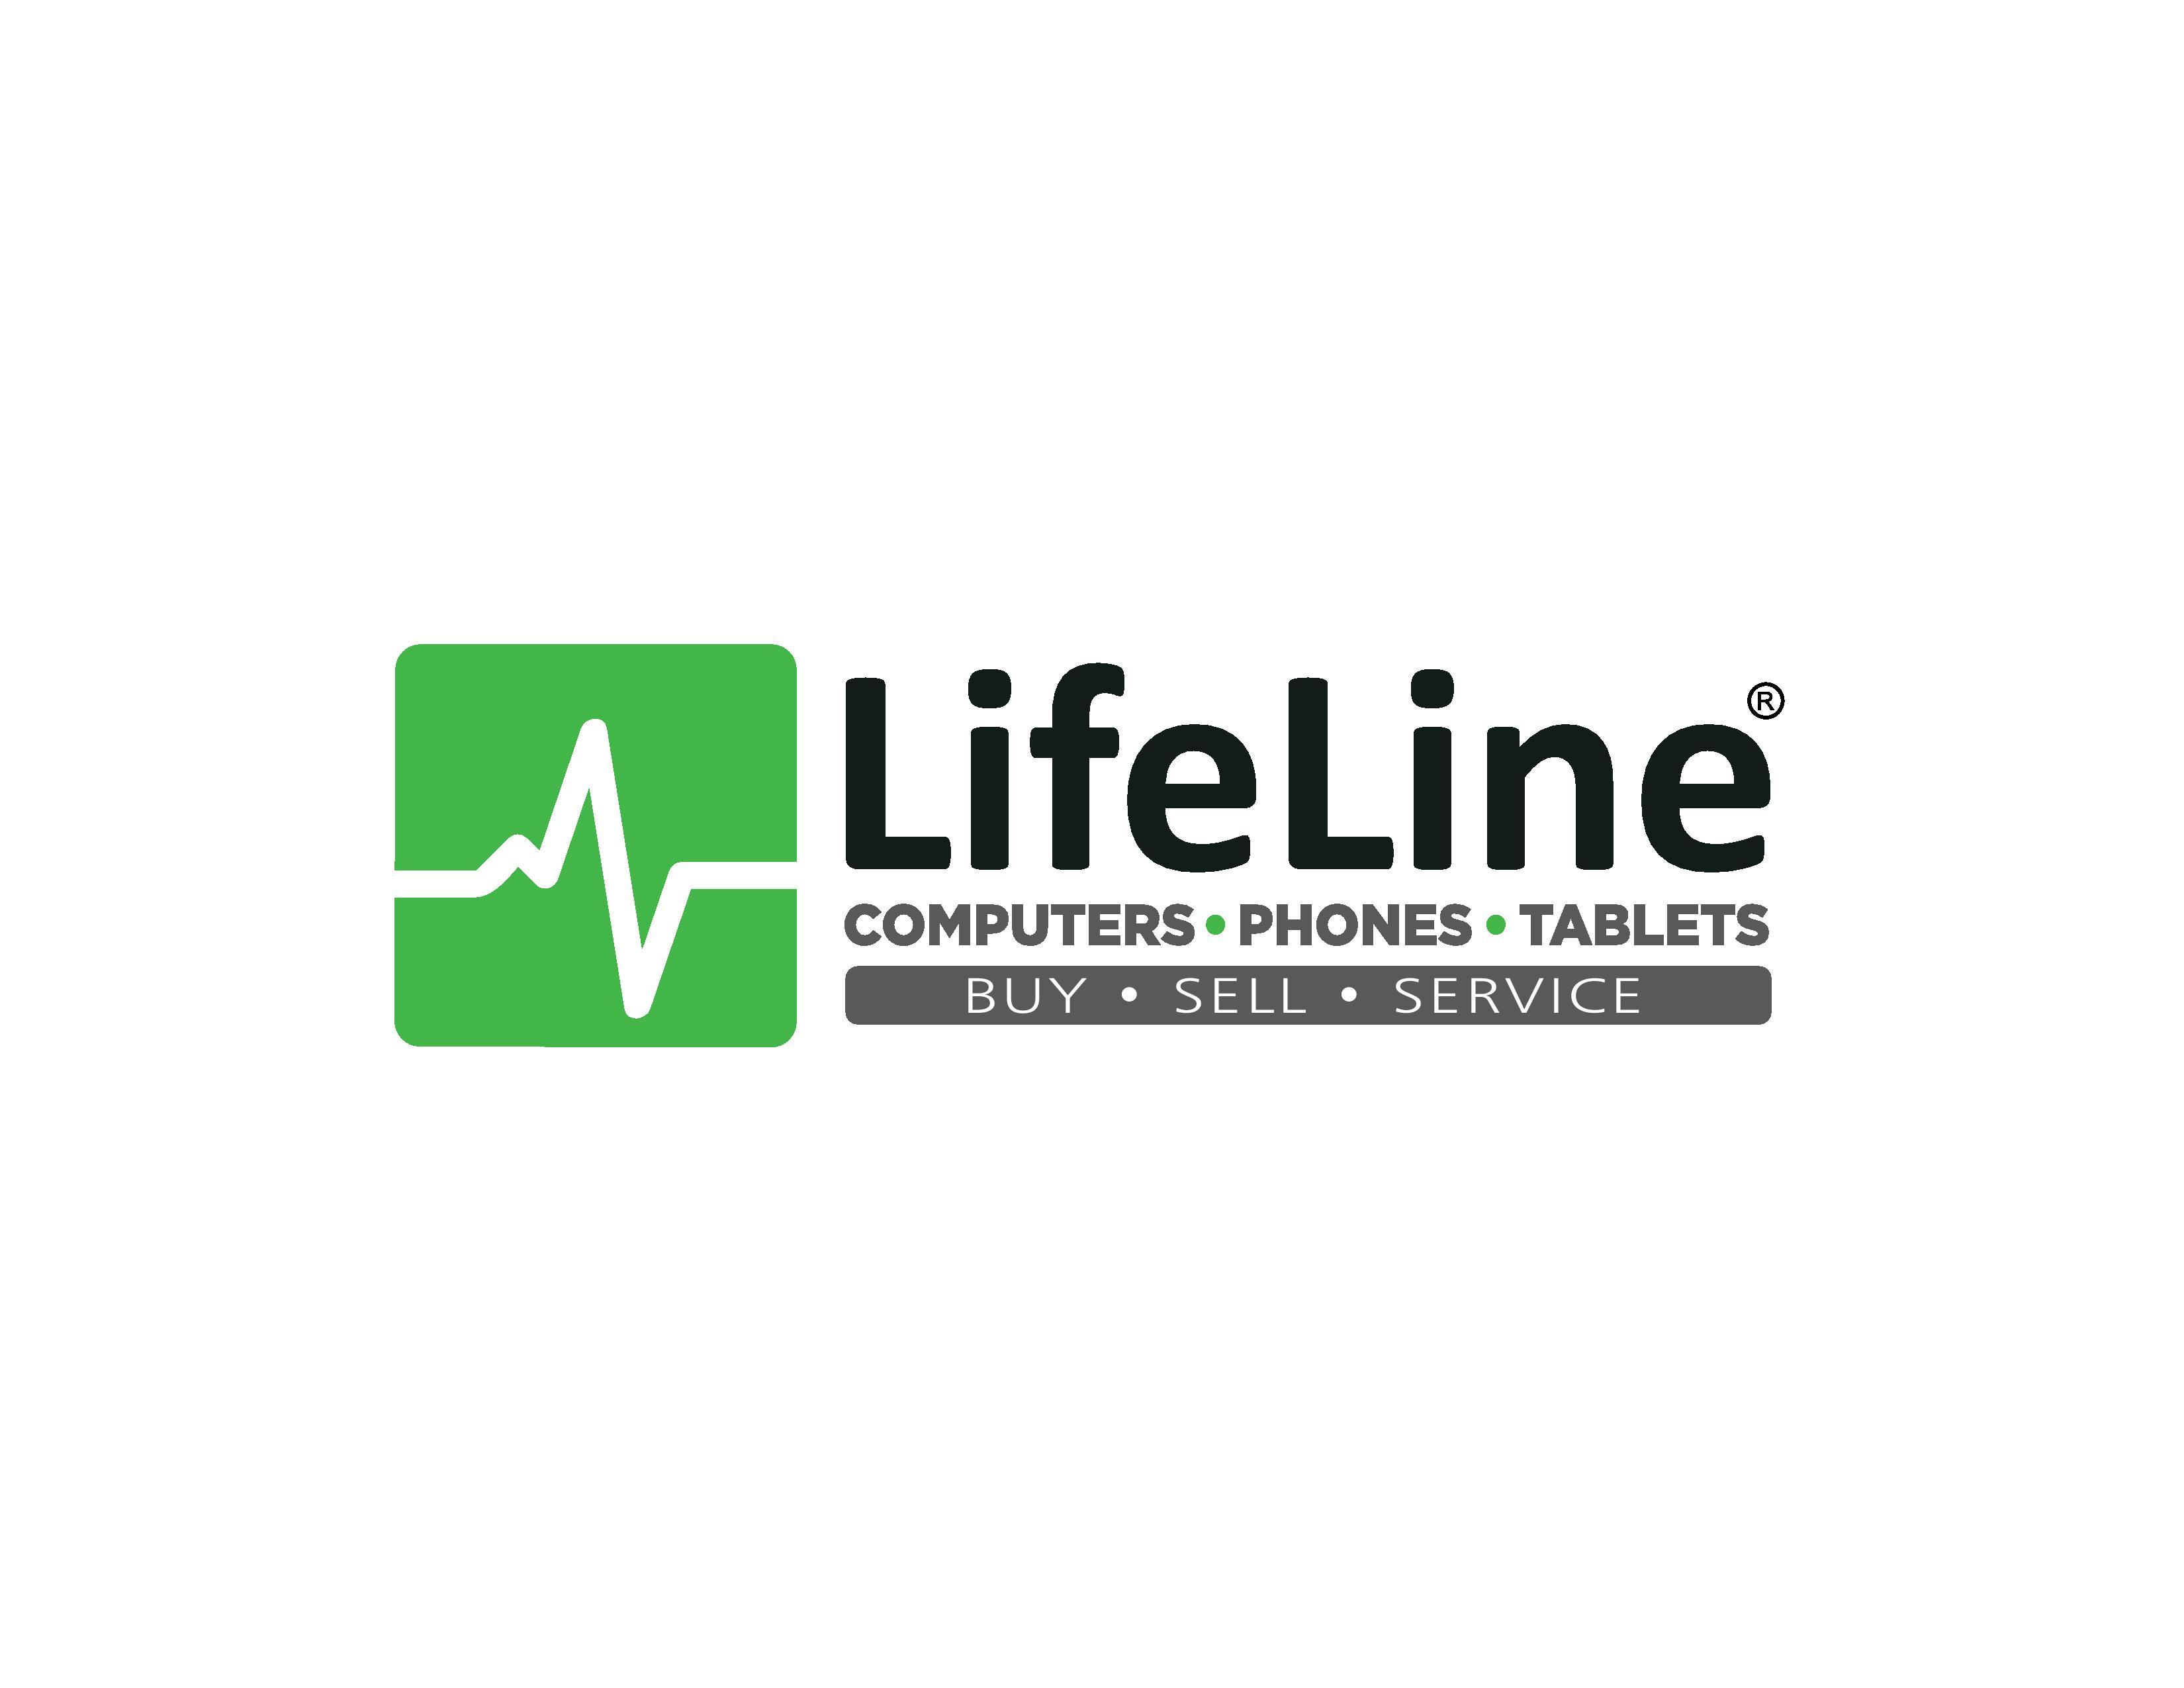 LifeLine_Logo_Tagline_BuySellTrade-page-001.jpg